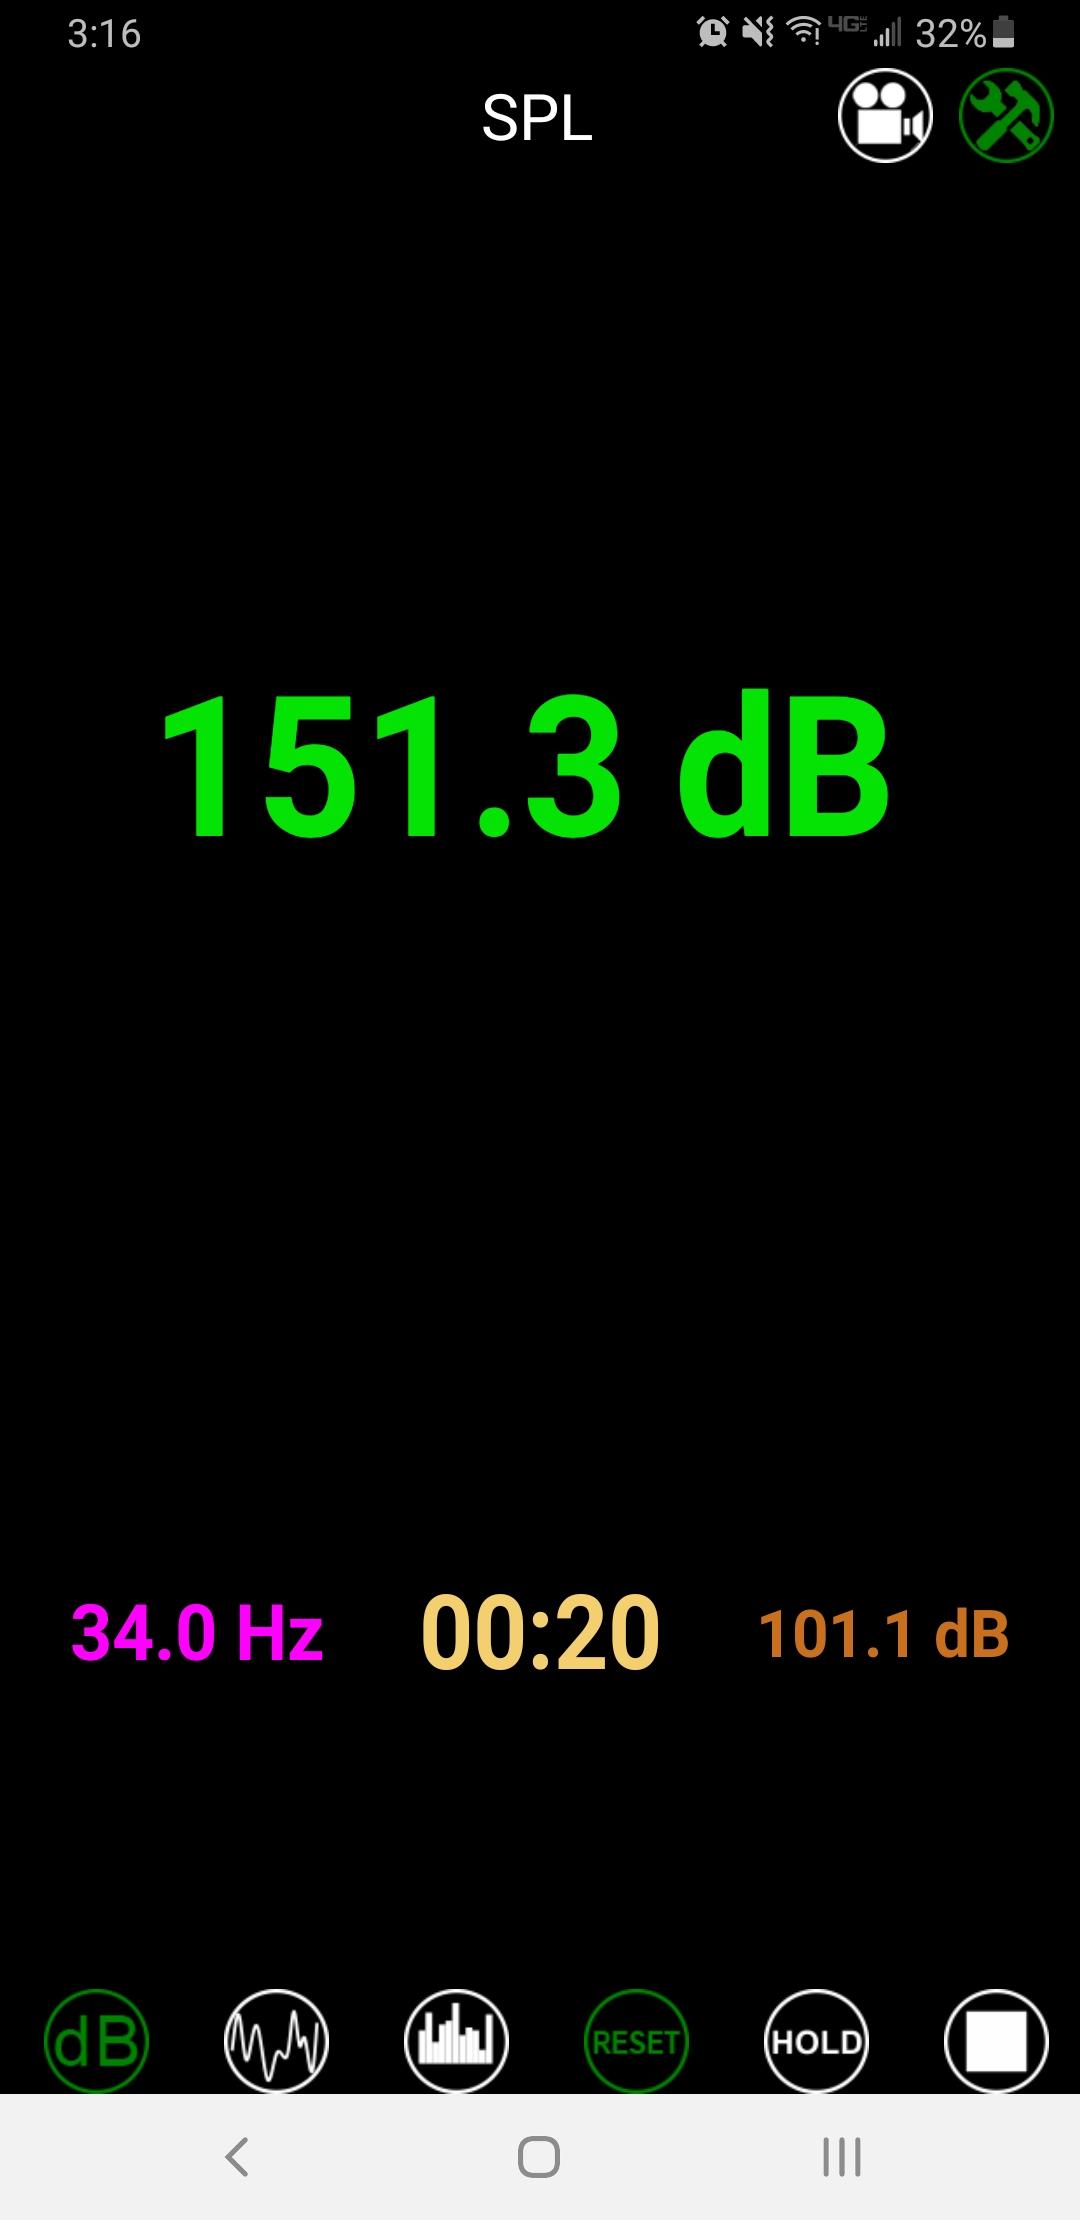 Screenshot_20200816-151637_SPL-LAB.jpg